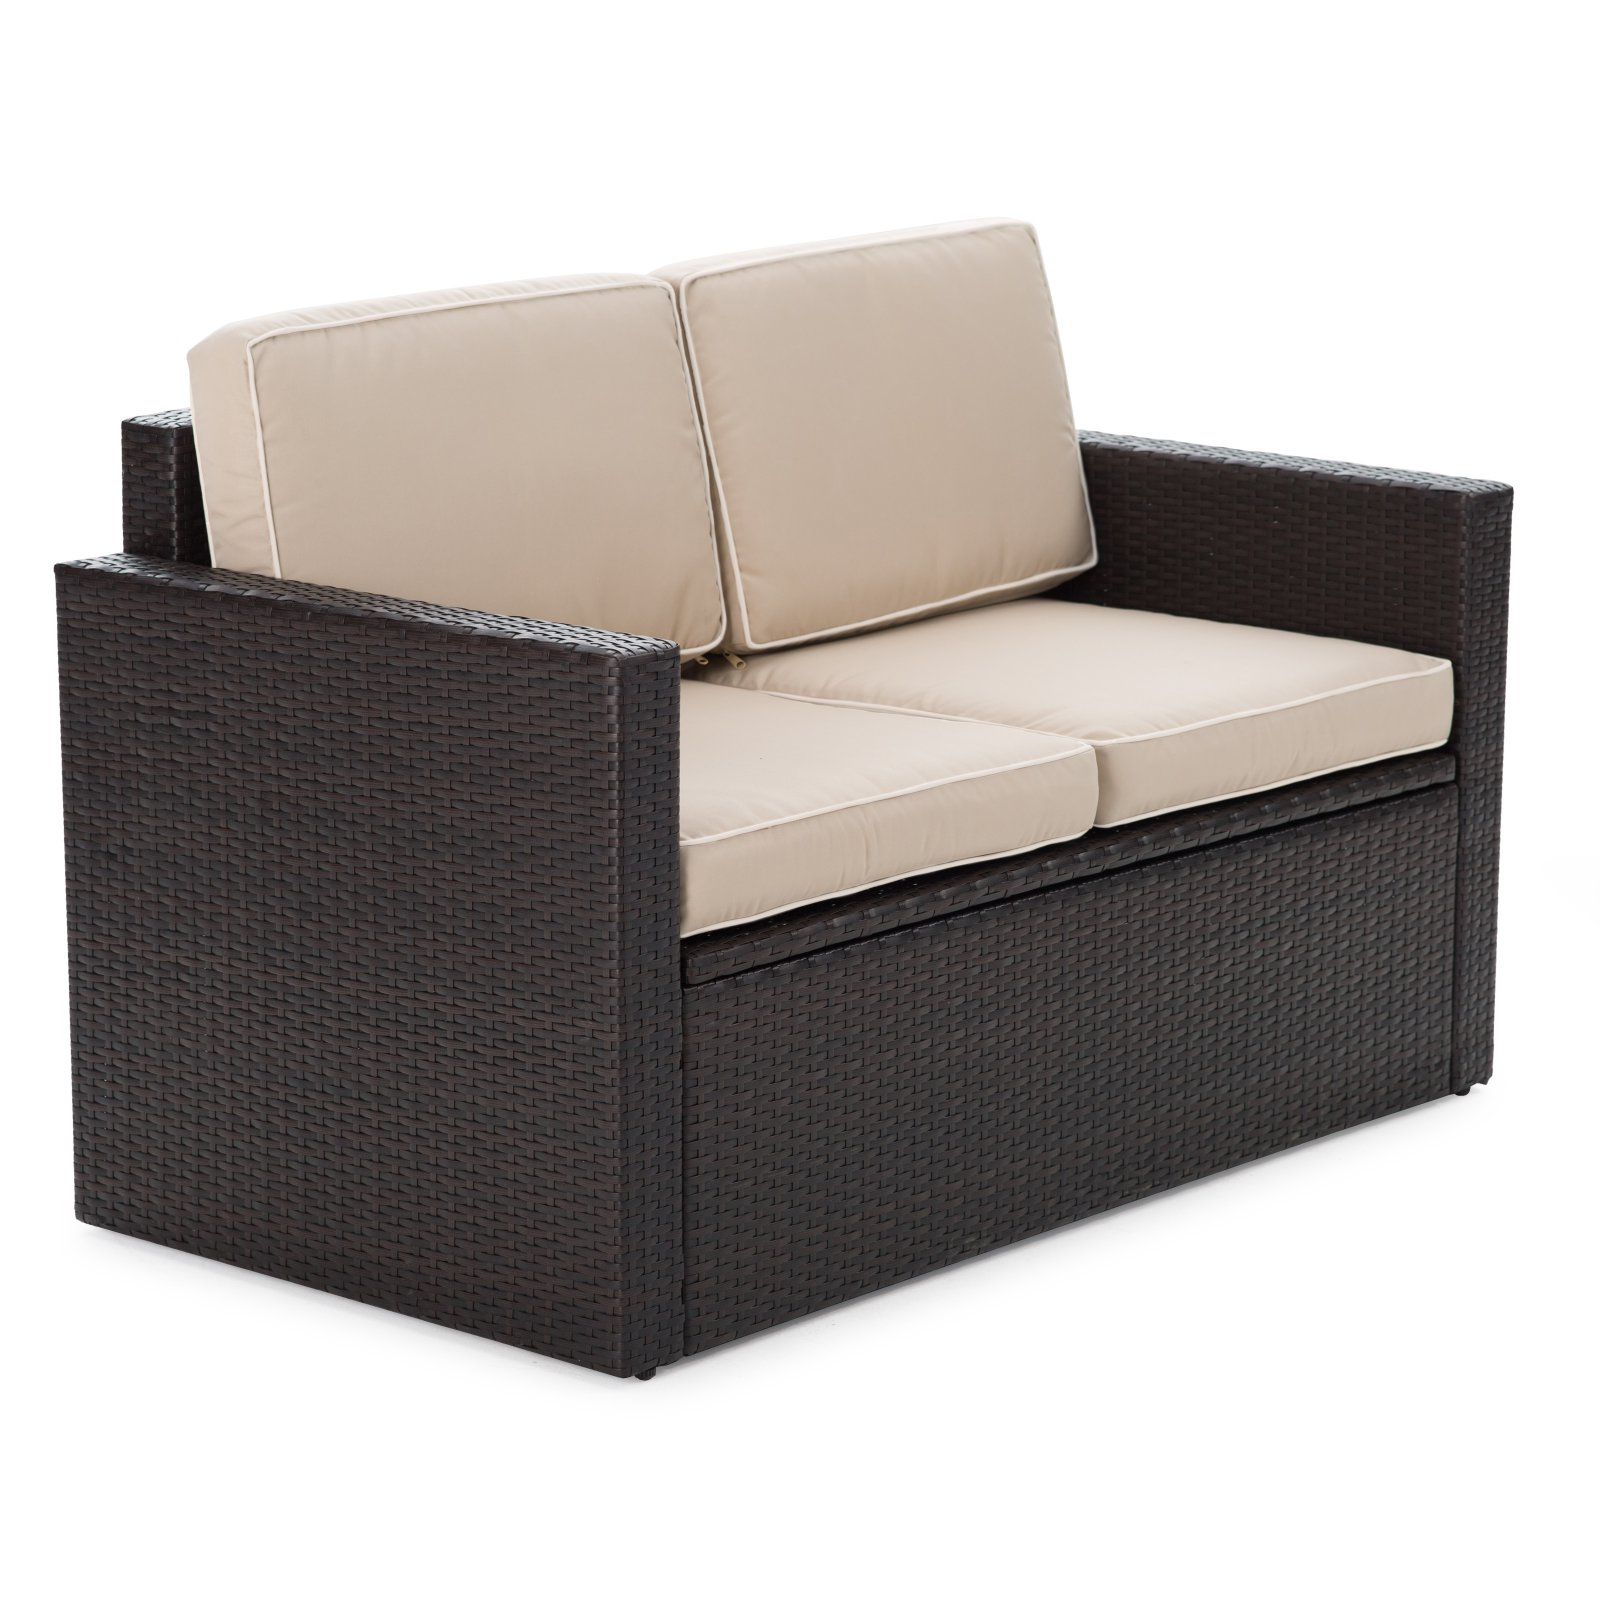 Carry Bird - Skylark Two  seater Outdoor sofa